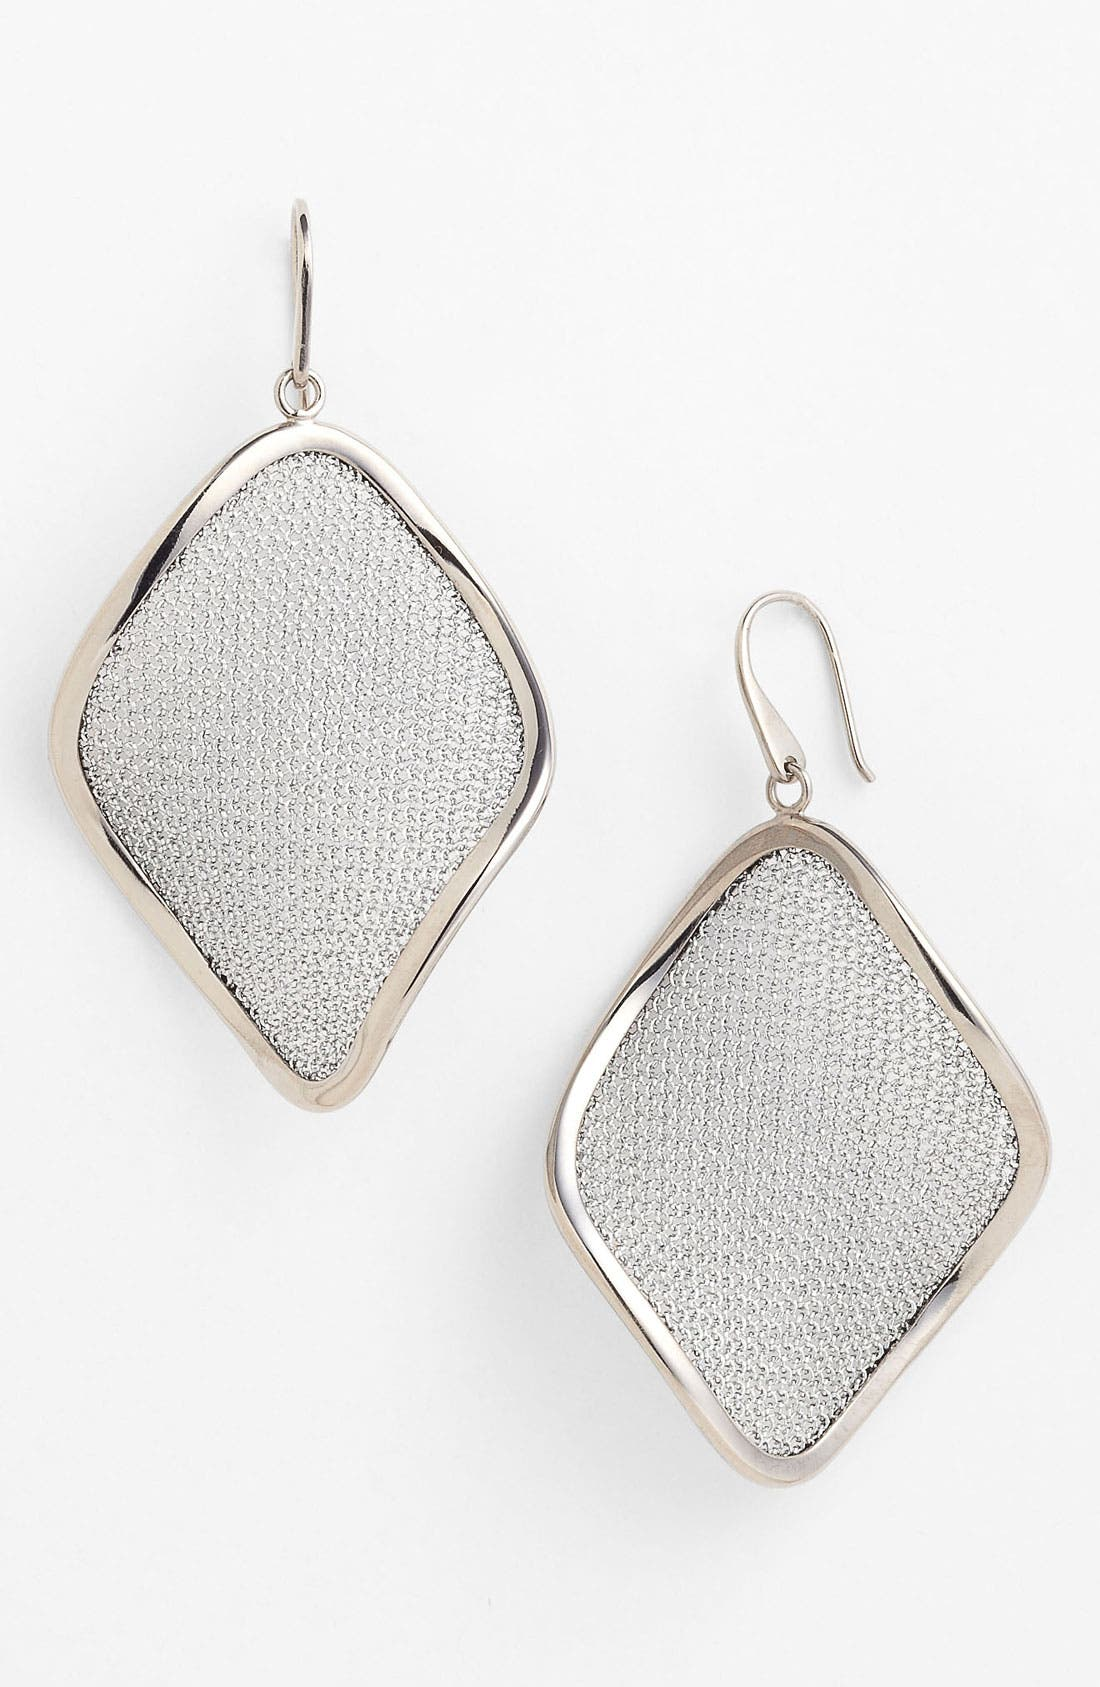 Alternate Image 1 Selected - Adami & Martucci 'Mesh' Large Drop Earrings